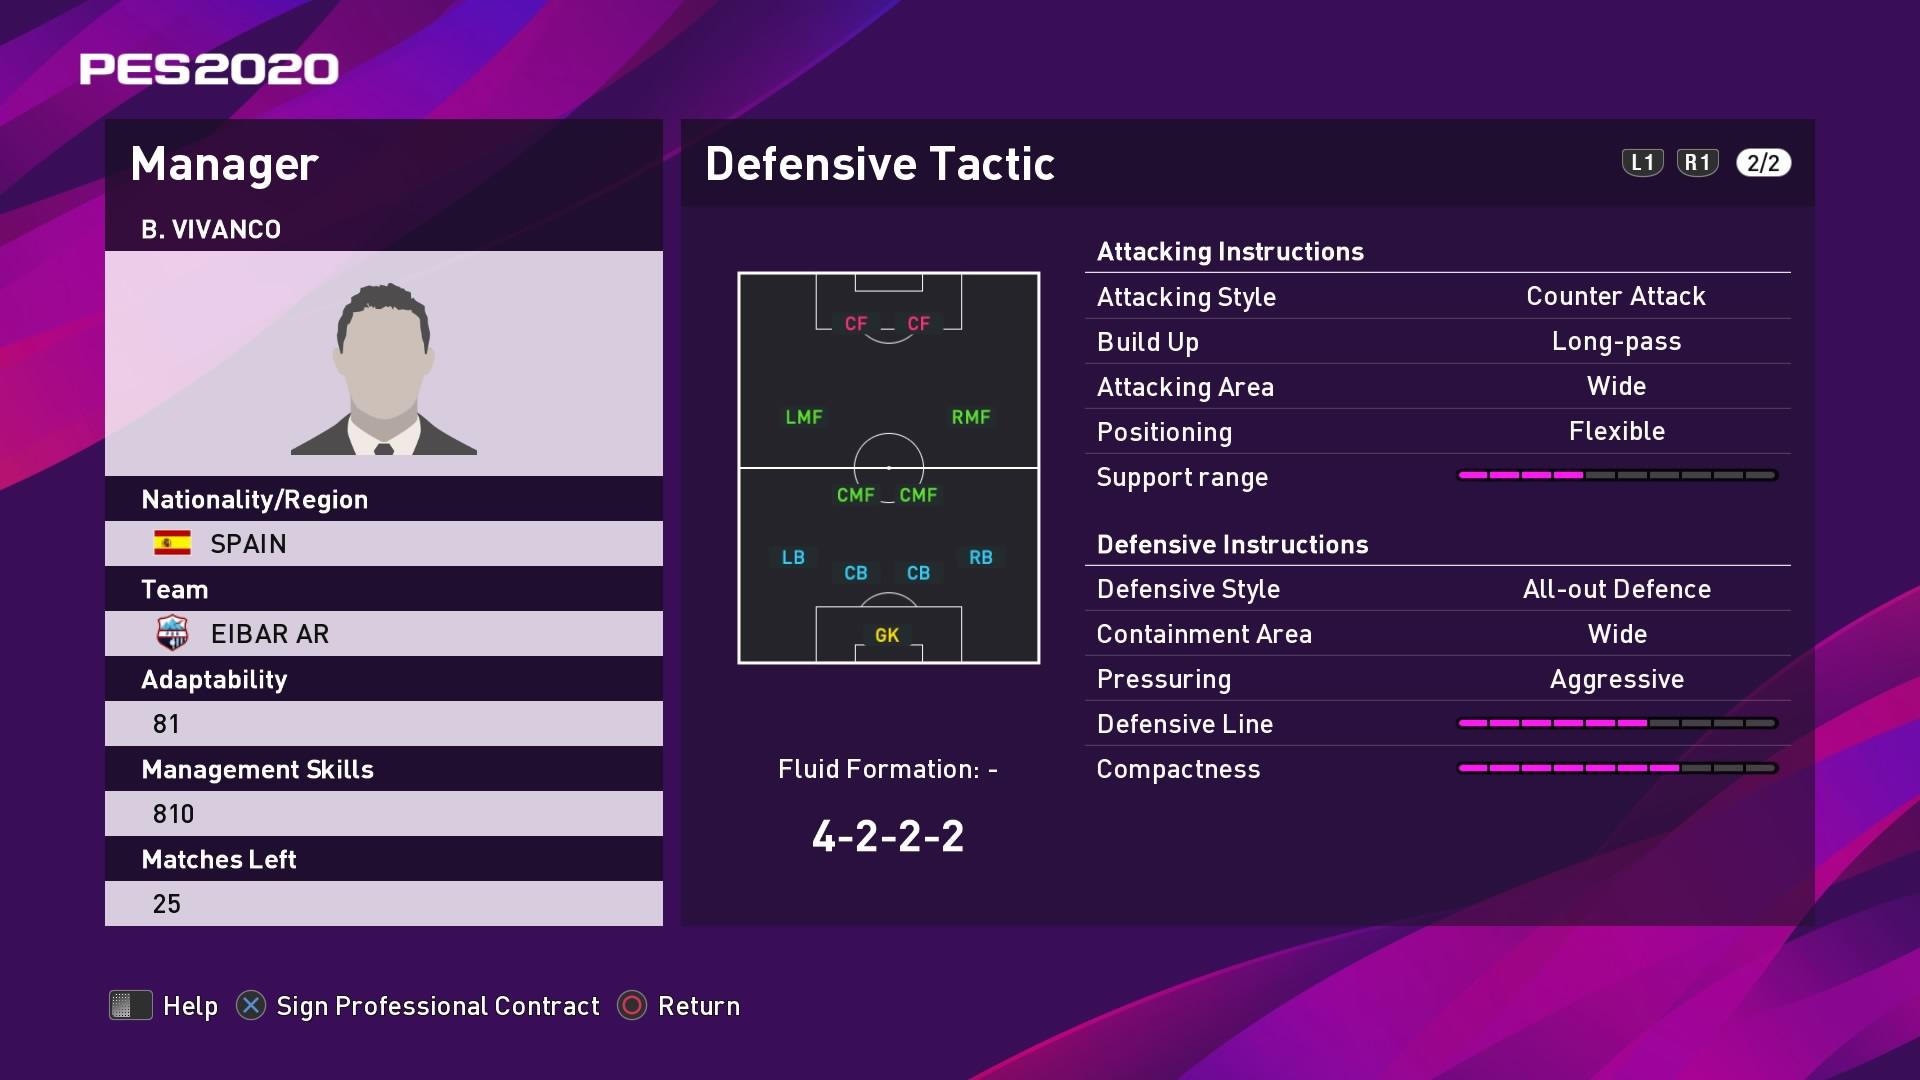 B. Vivanco (José Luis Mendilibar) Defensive Tactic in PES 2020 myClub